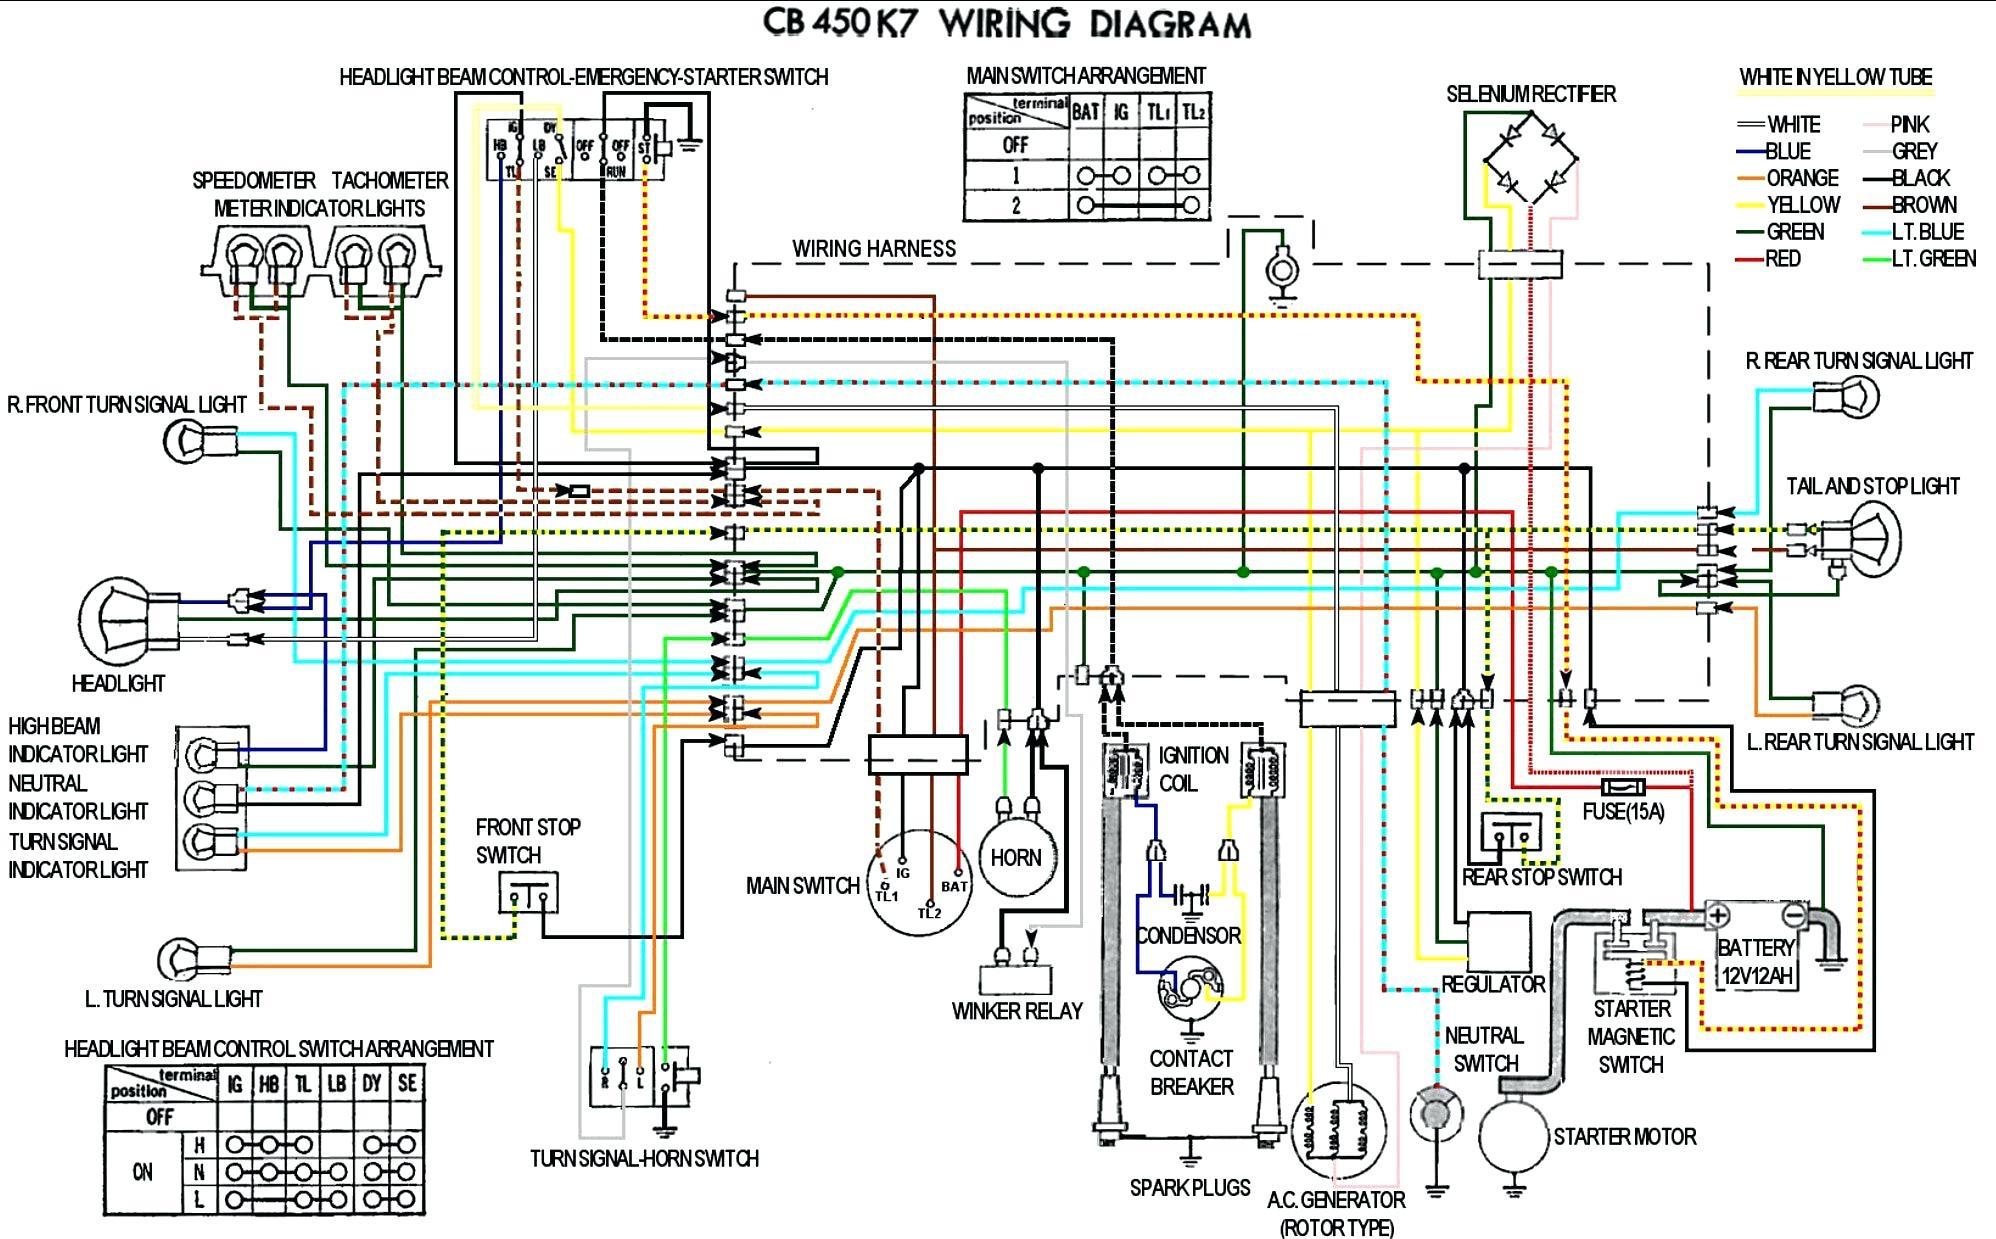 john deere alternator wiring diagram free download john deere 450d wiring diagram e1 wiring diagram  john deere 450d wiring diagram e1